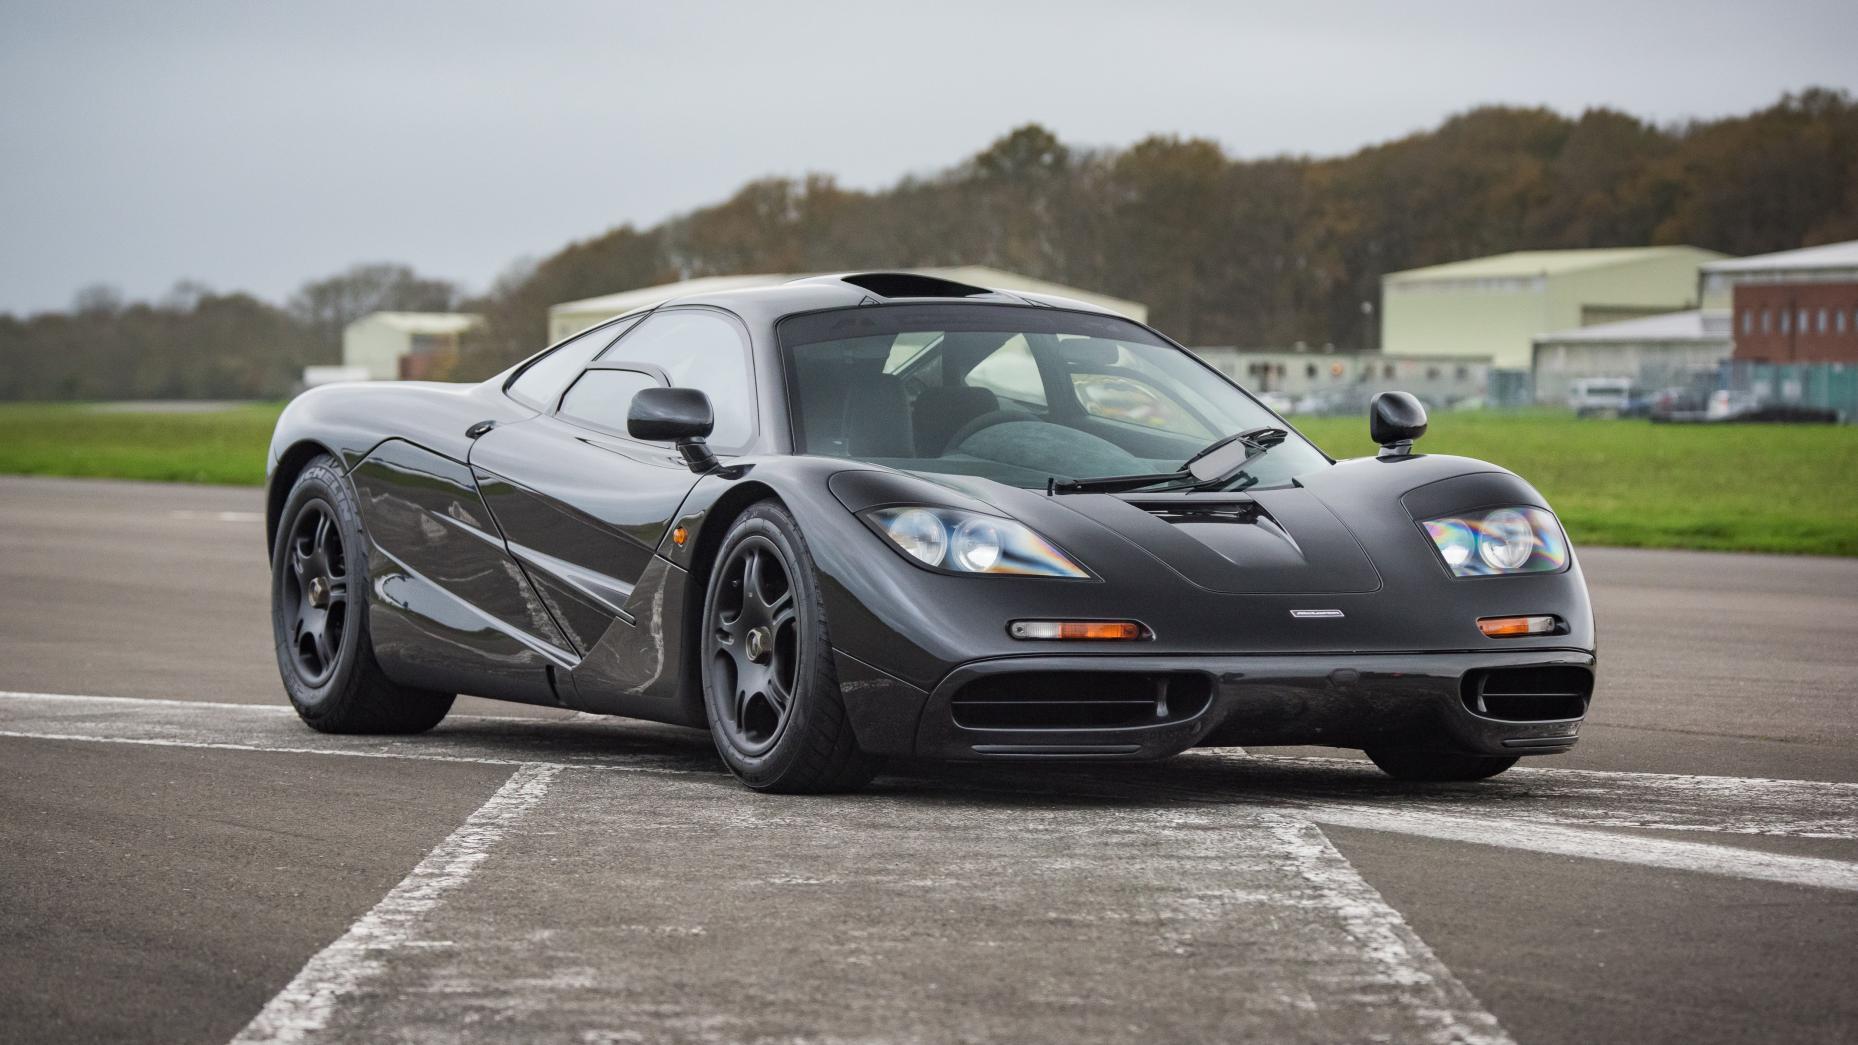 Top Gear | Euro Palace Casino Blog - Part 2